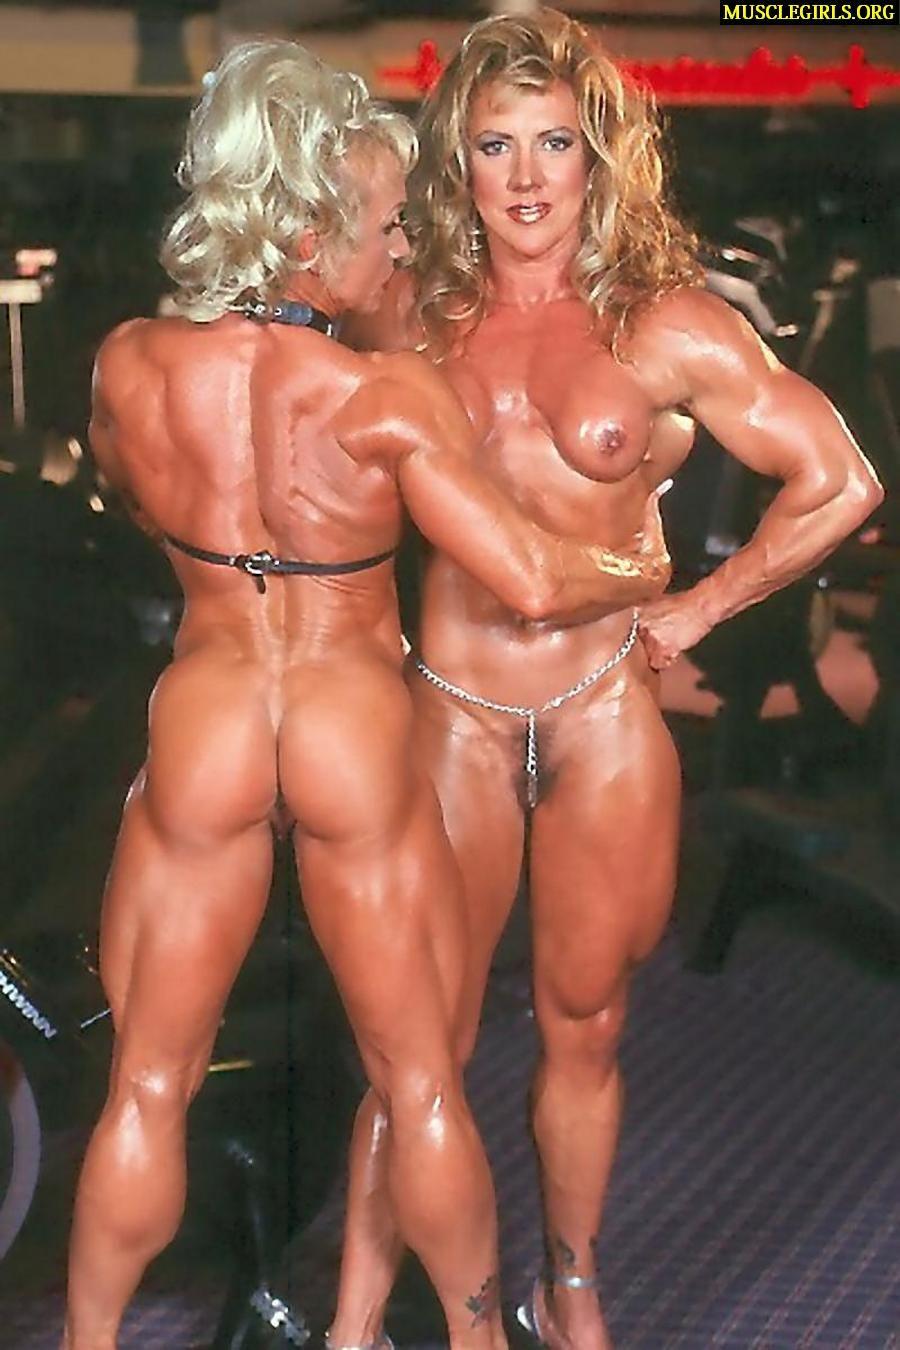 Bodybuilder Striptease On Webcam